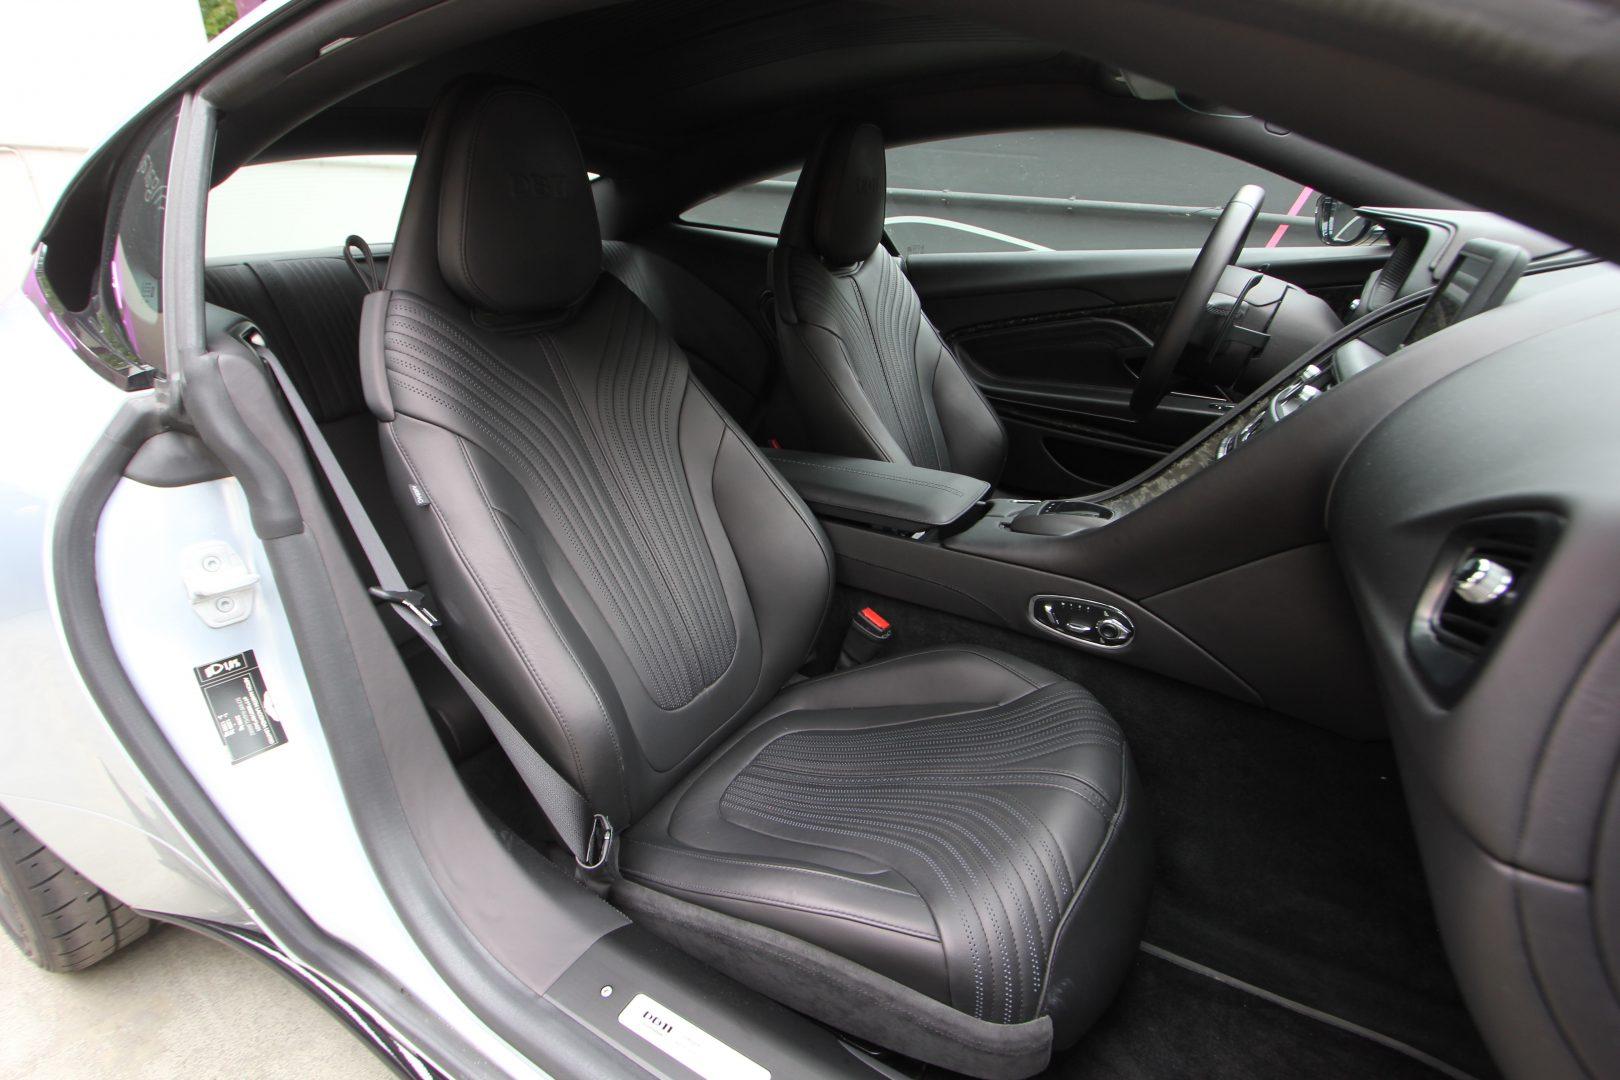 AIL Aston Martin DB11 Coupe 5.2 V12 8